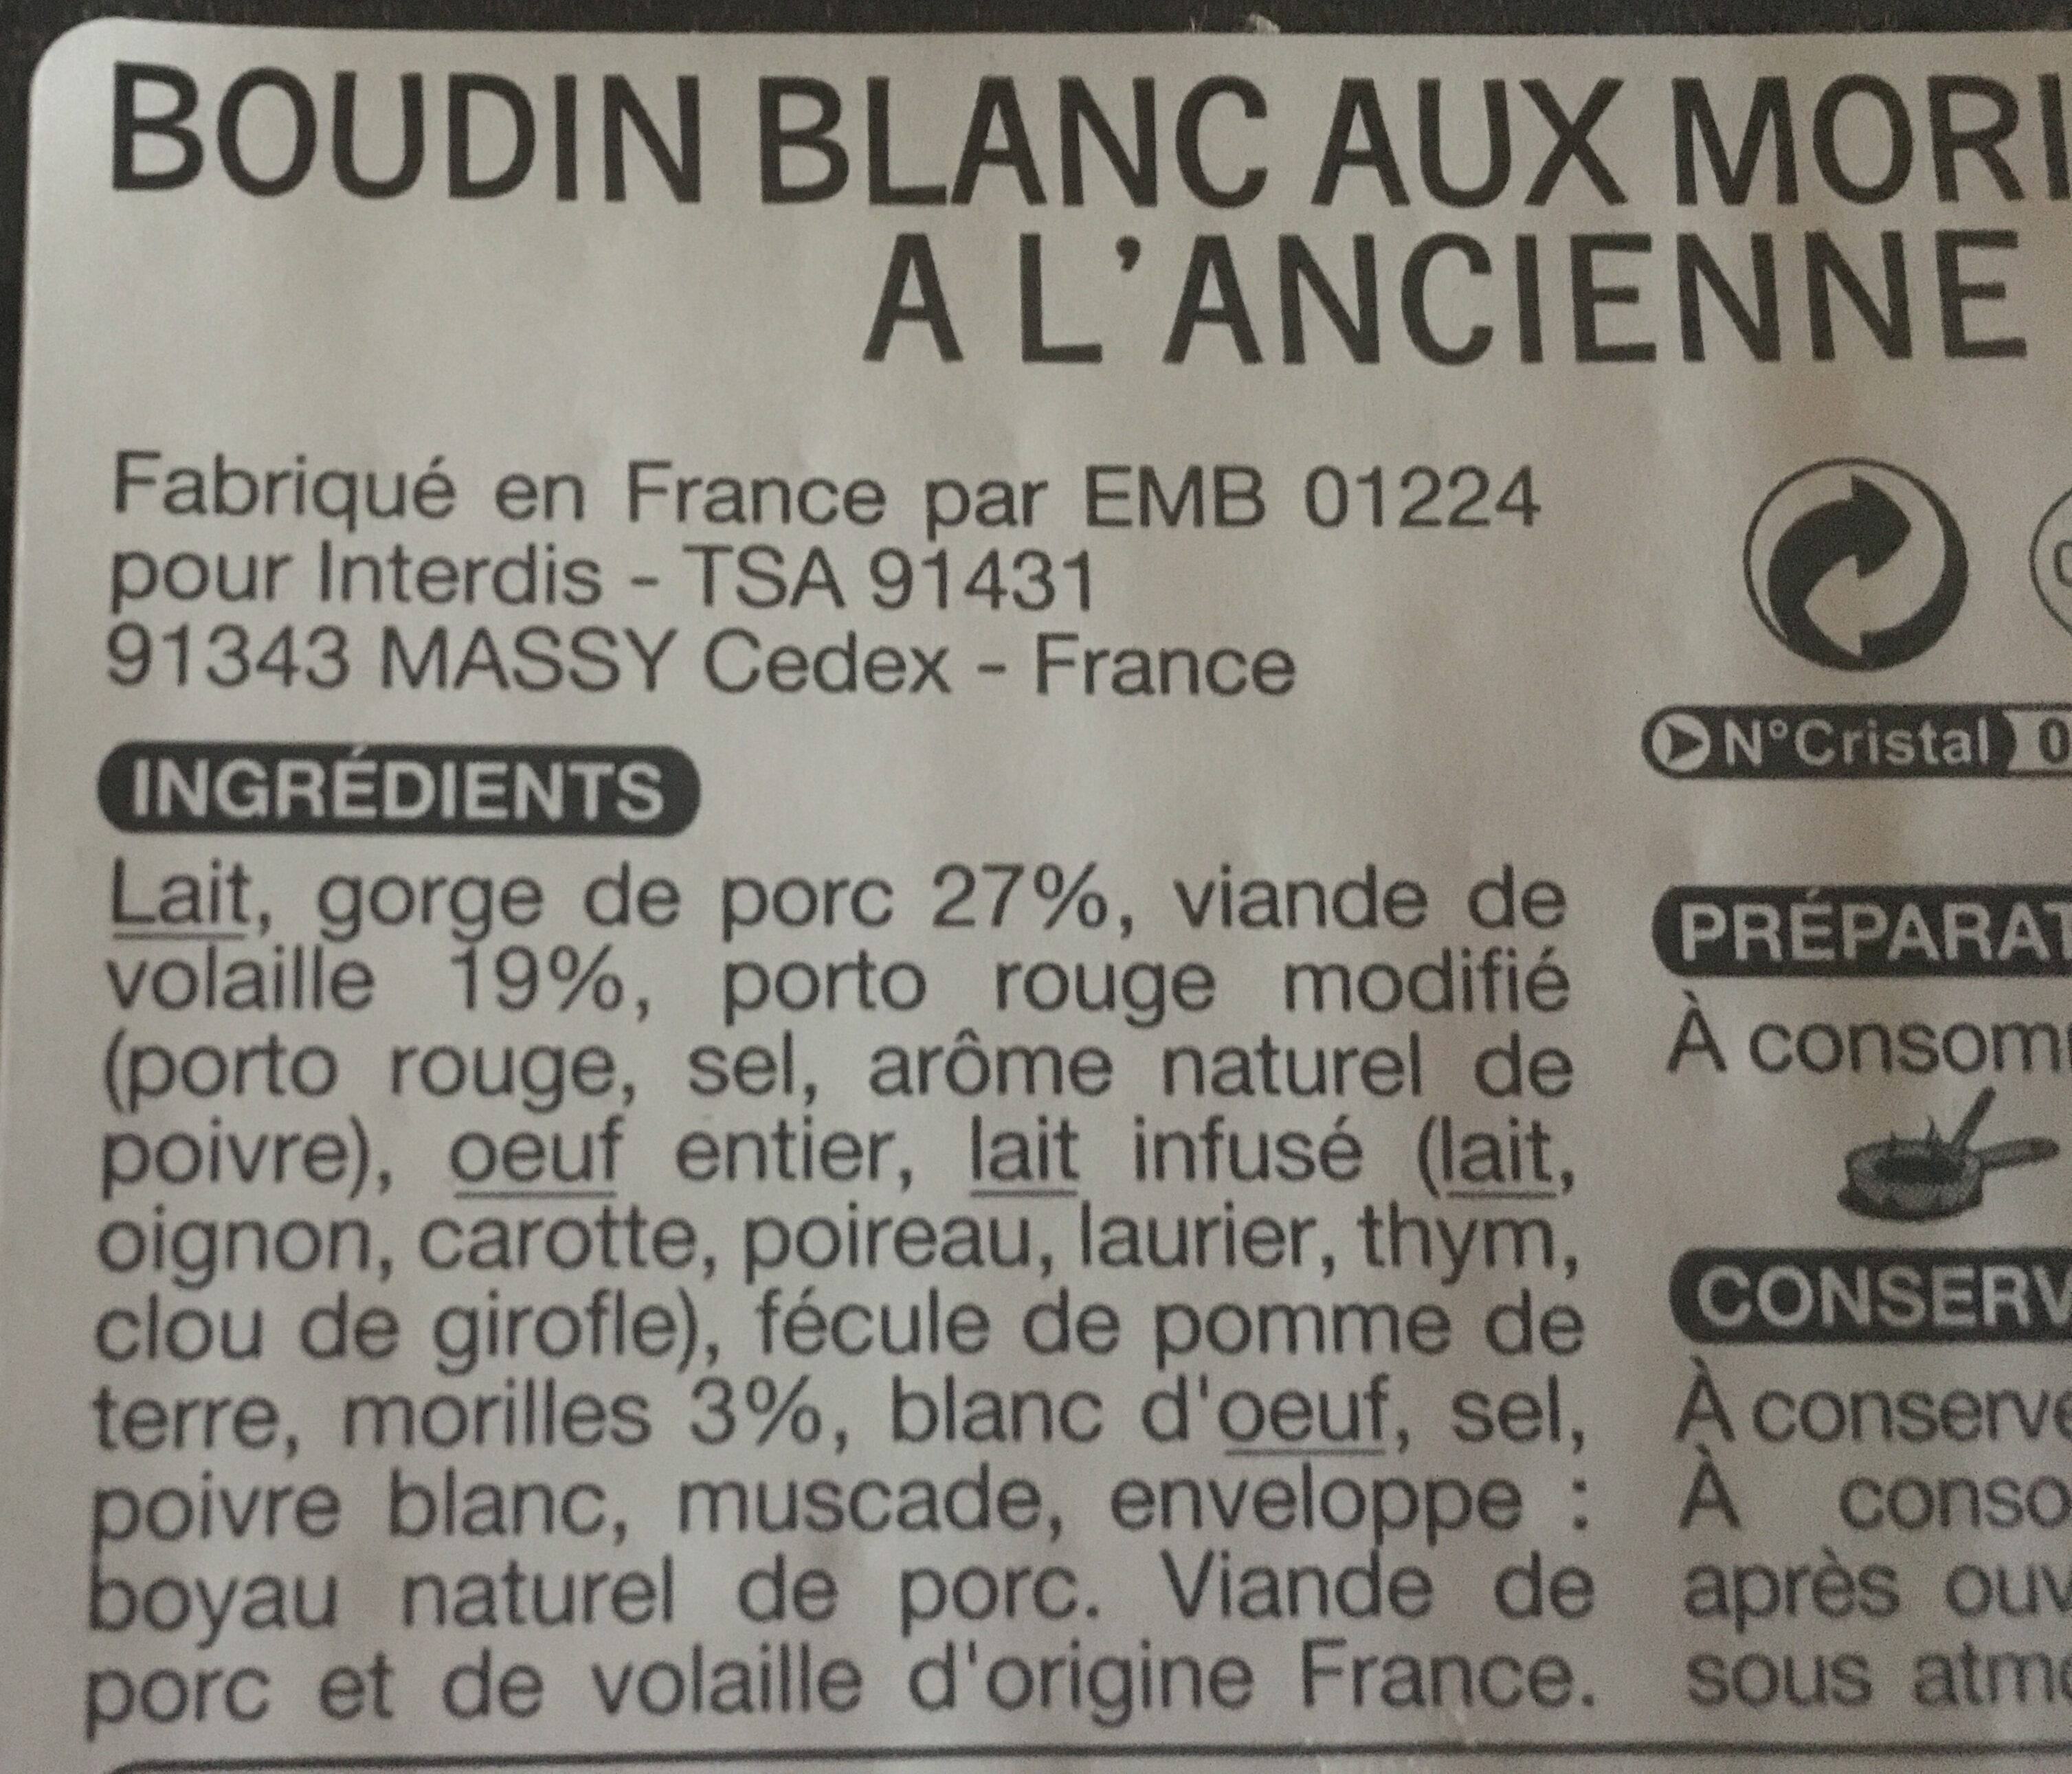 Boudins blancs aux morilles à l'ancienne - Ingrediënten - fr